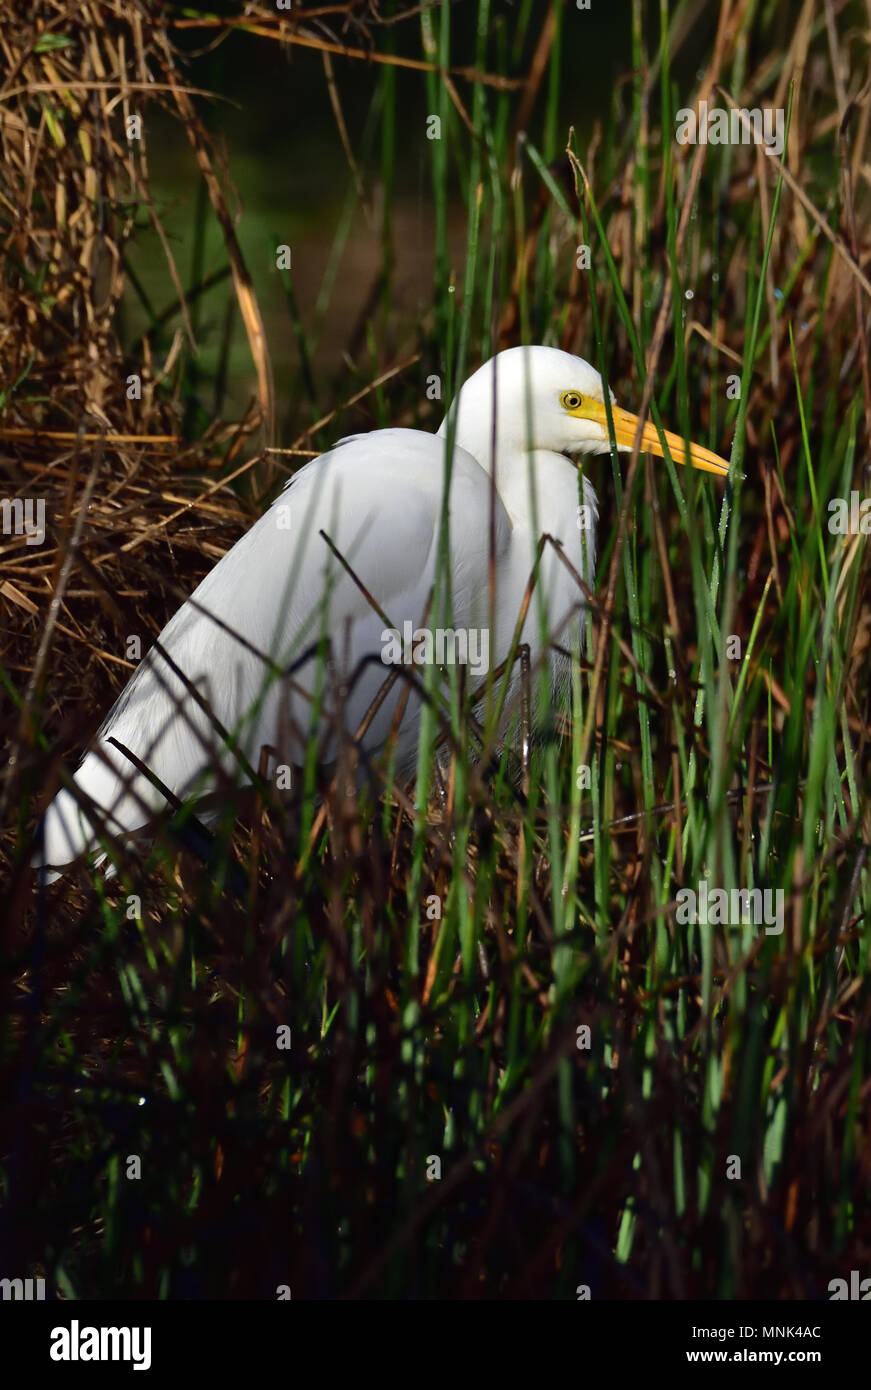 An Australian, Queensland nonbreeding Intermediate Egret, Ardea intermedia standing in thick grass - Stock Image